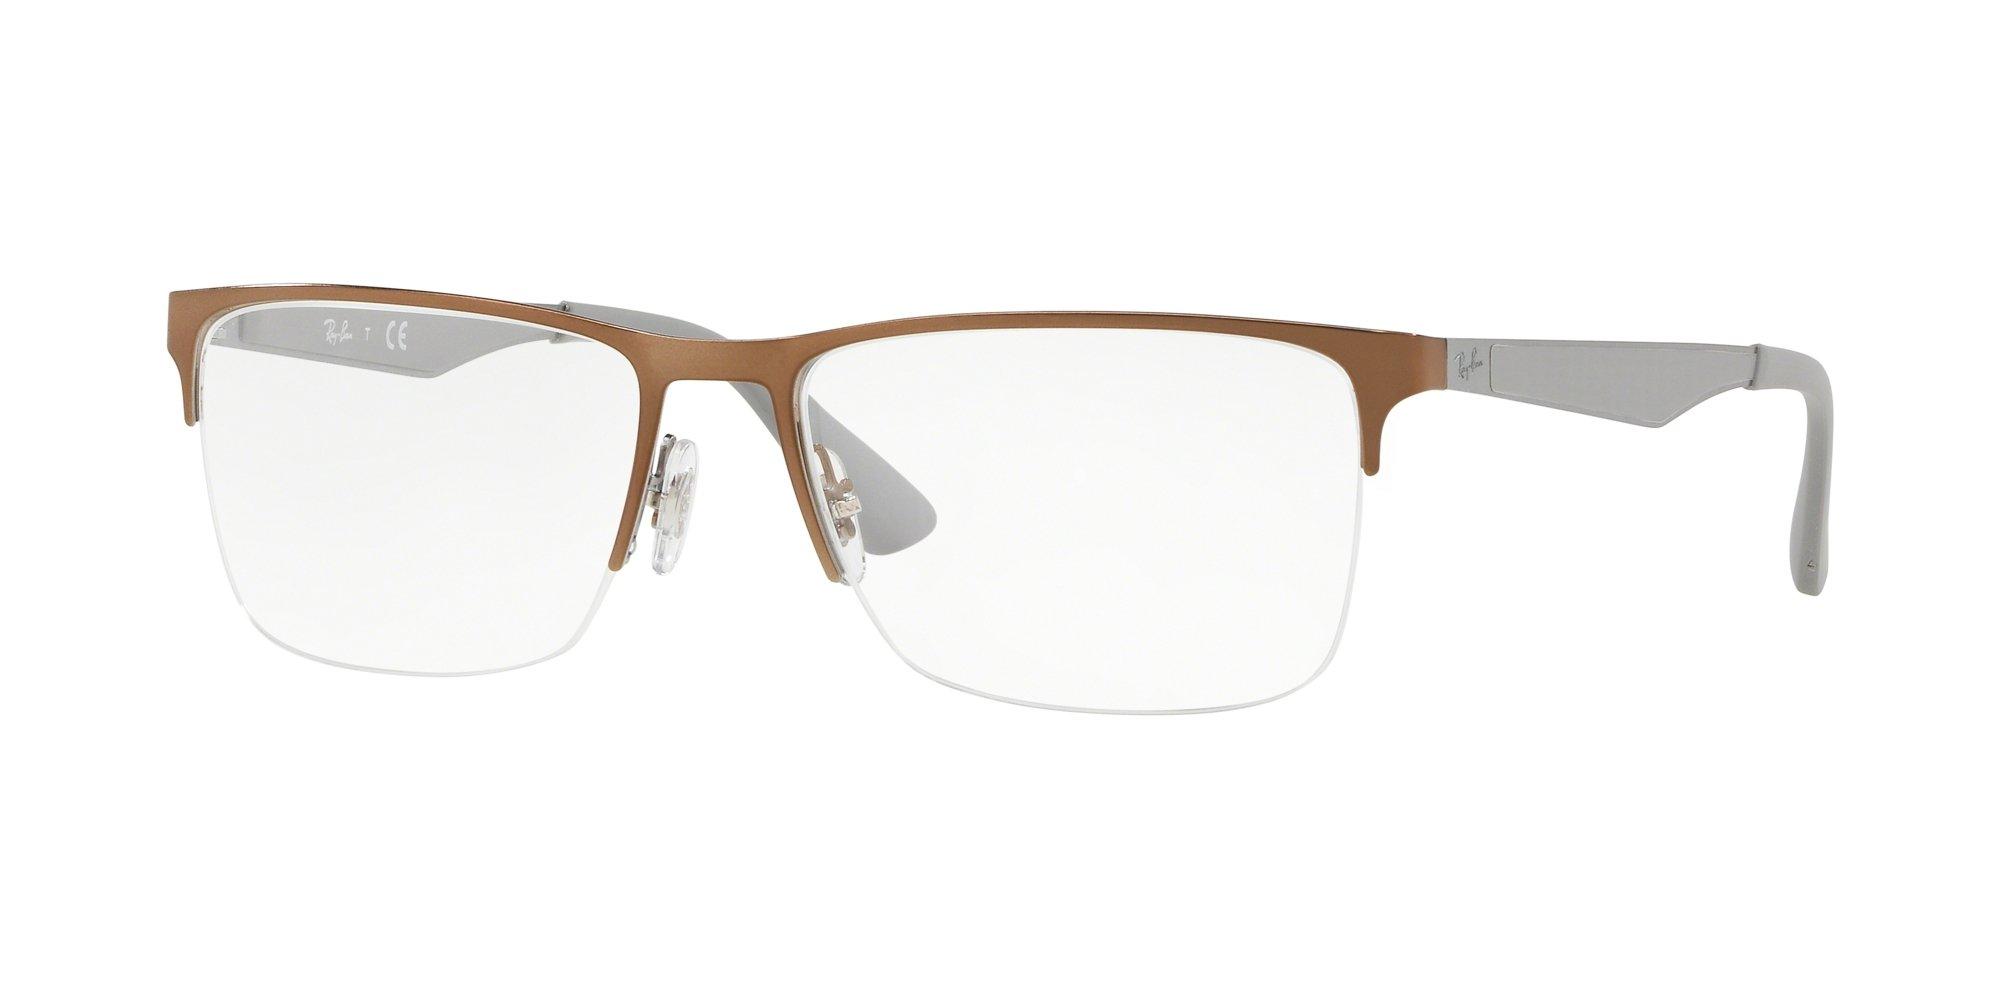 Ray-Ban RX6335 Eyeglasses Light Brown 56mm by Ray-Ban